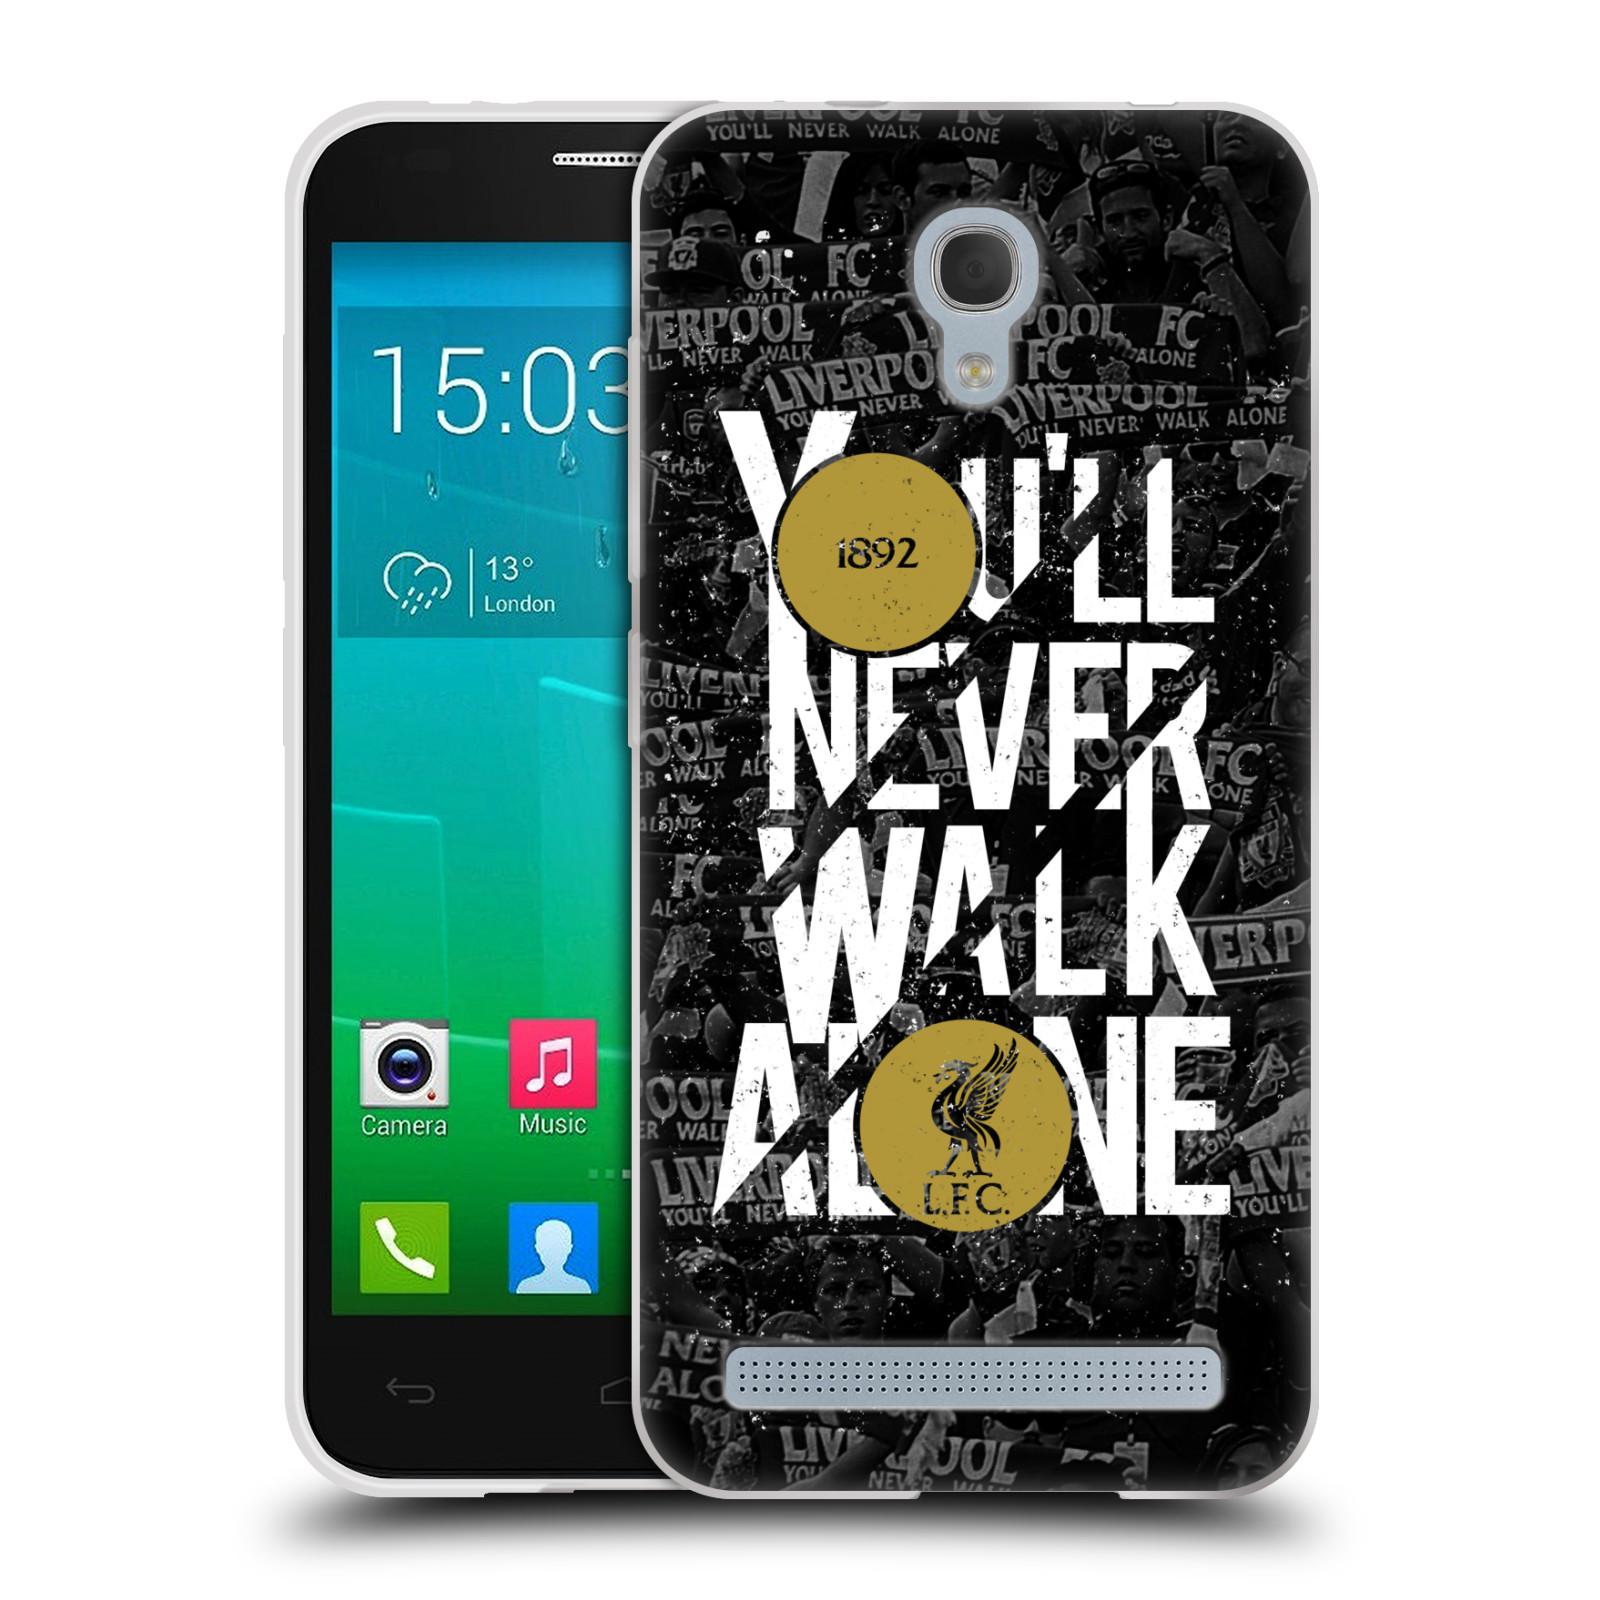 Silikonové pouzdro na mobil Alcatel One Touch Idol 2 Mini S 6036Y HEAD CASE 1892 LFC You'll Never Walk Alone (Silikonový kryt či obal na mobilní telefon Liverpool FC Official pro Alcatel Idol 2 Mini S OT-6036Y)